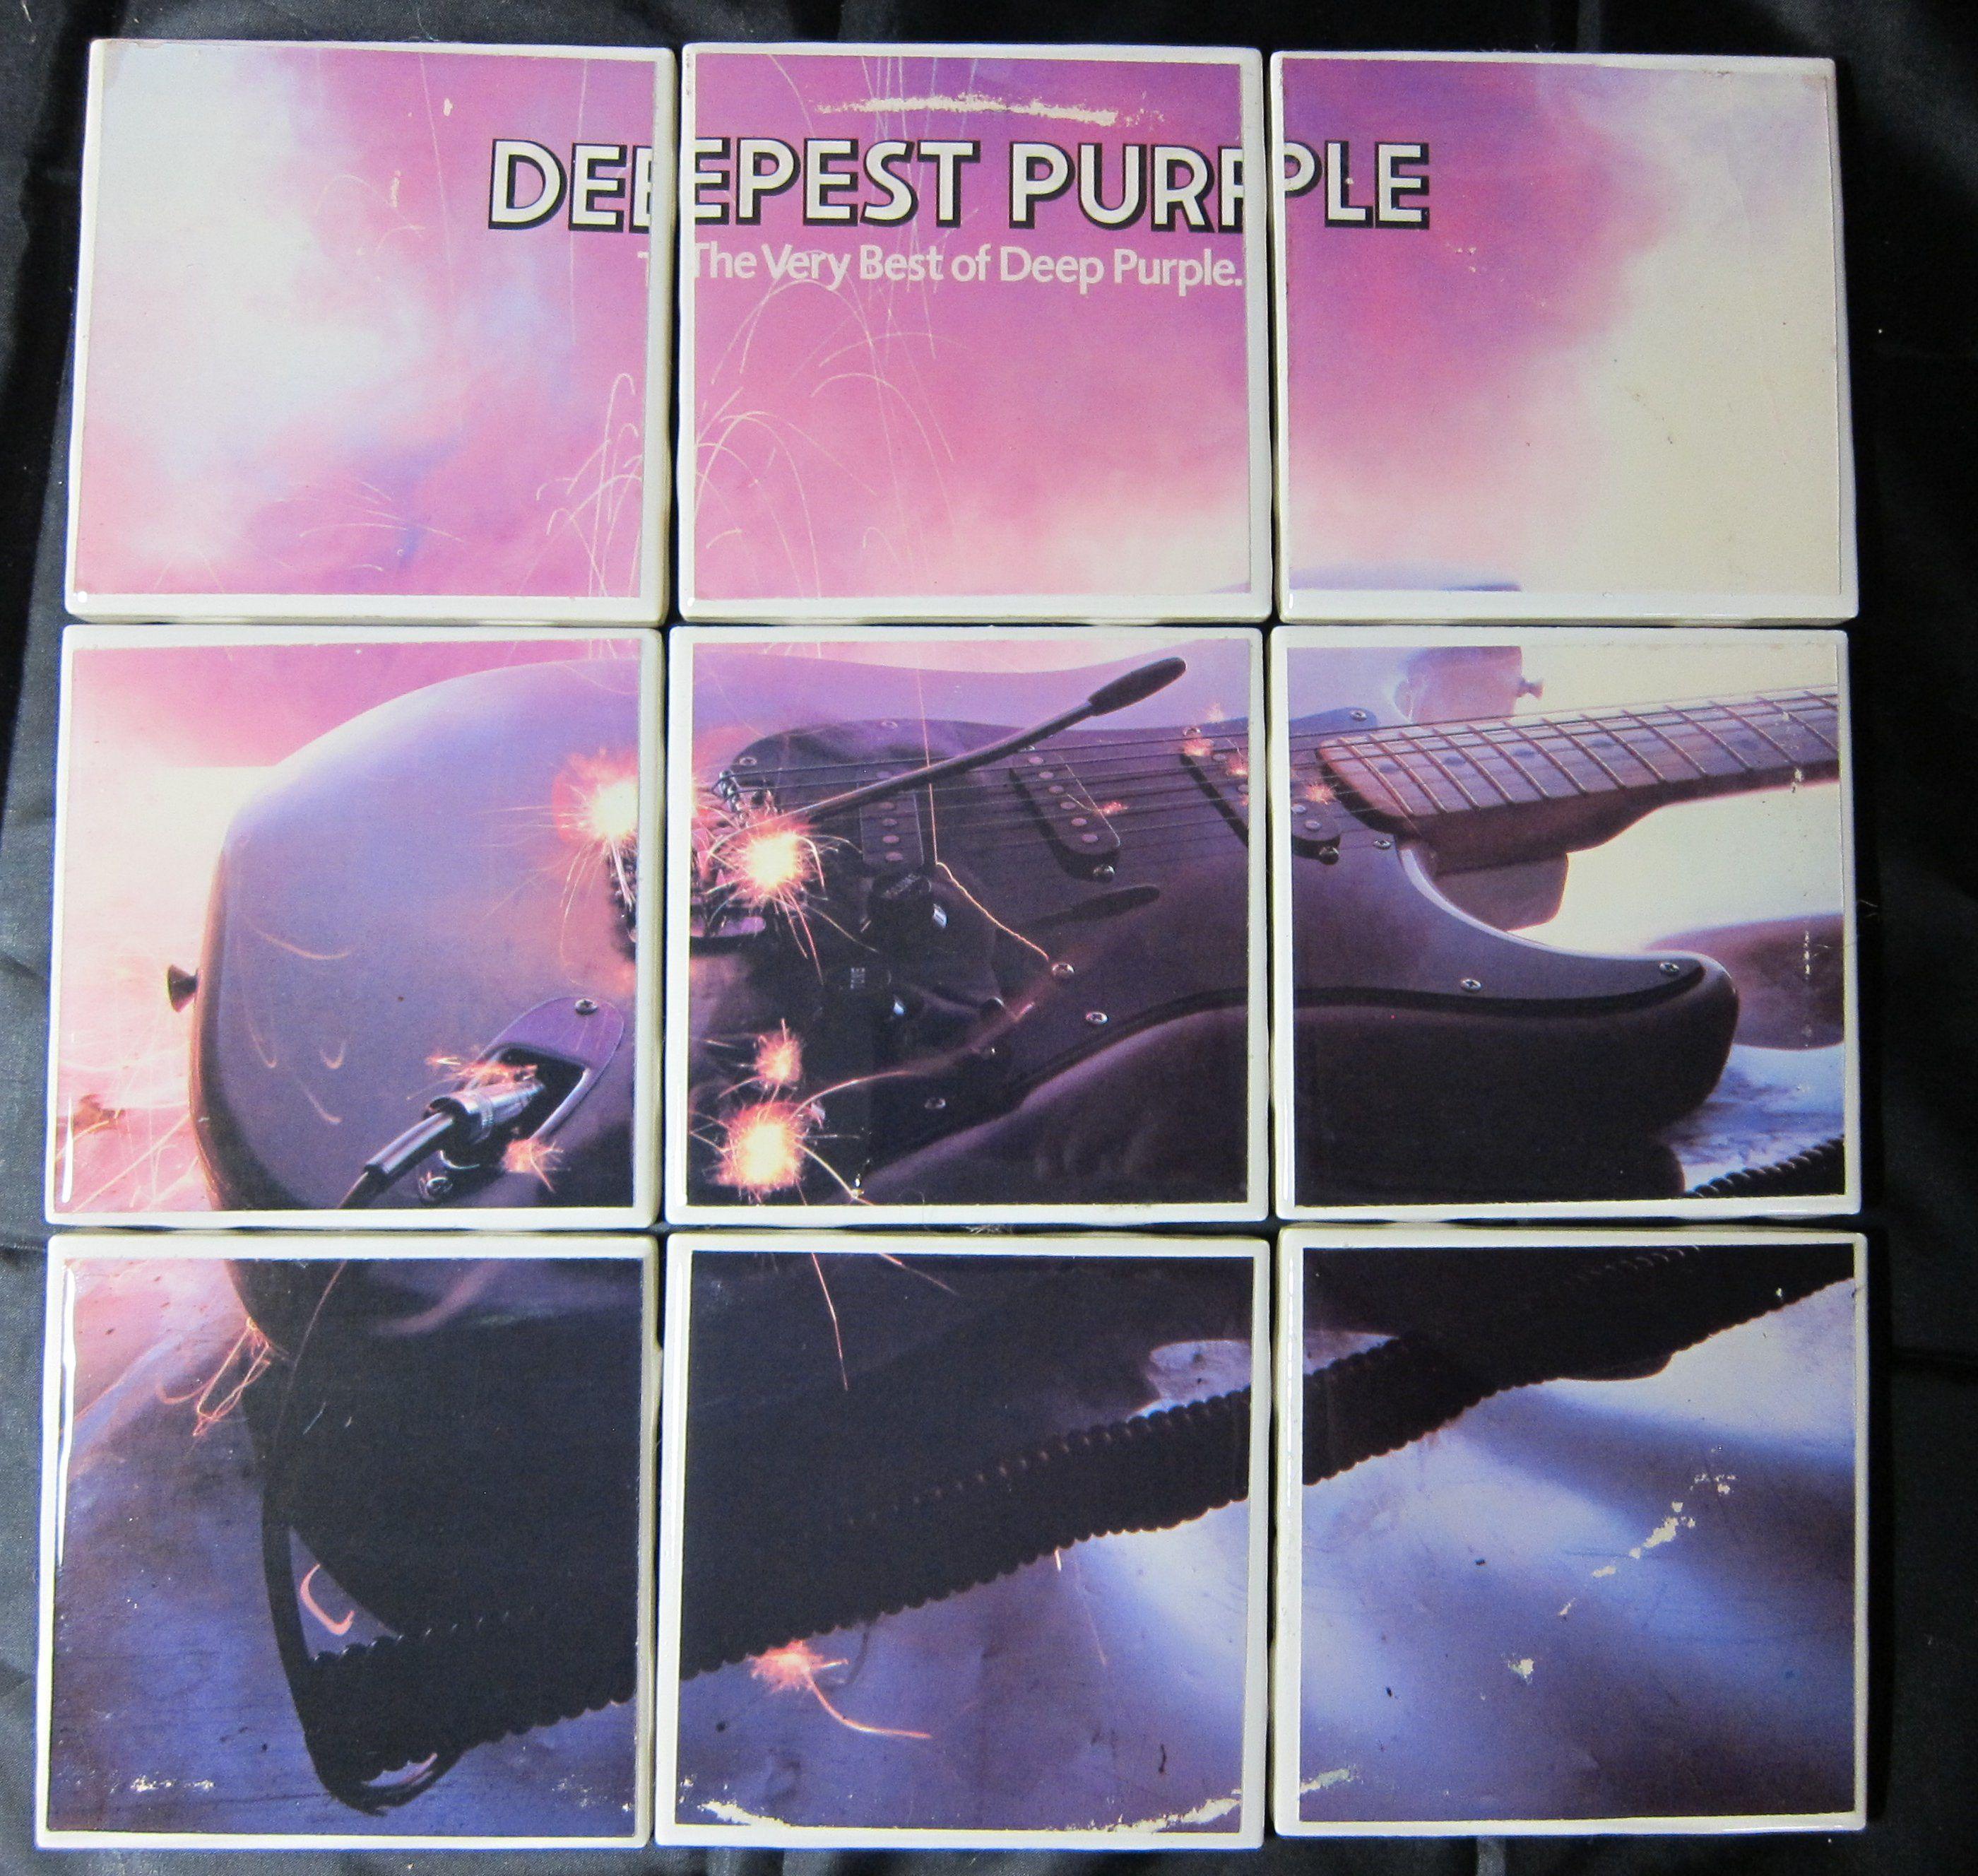 Deep Purple Deepest Purple The Very Best Of Deep Purple Etsy Deep Purple Vinyl Record Art Used Vinyl Records